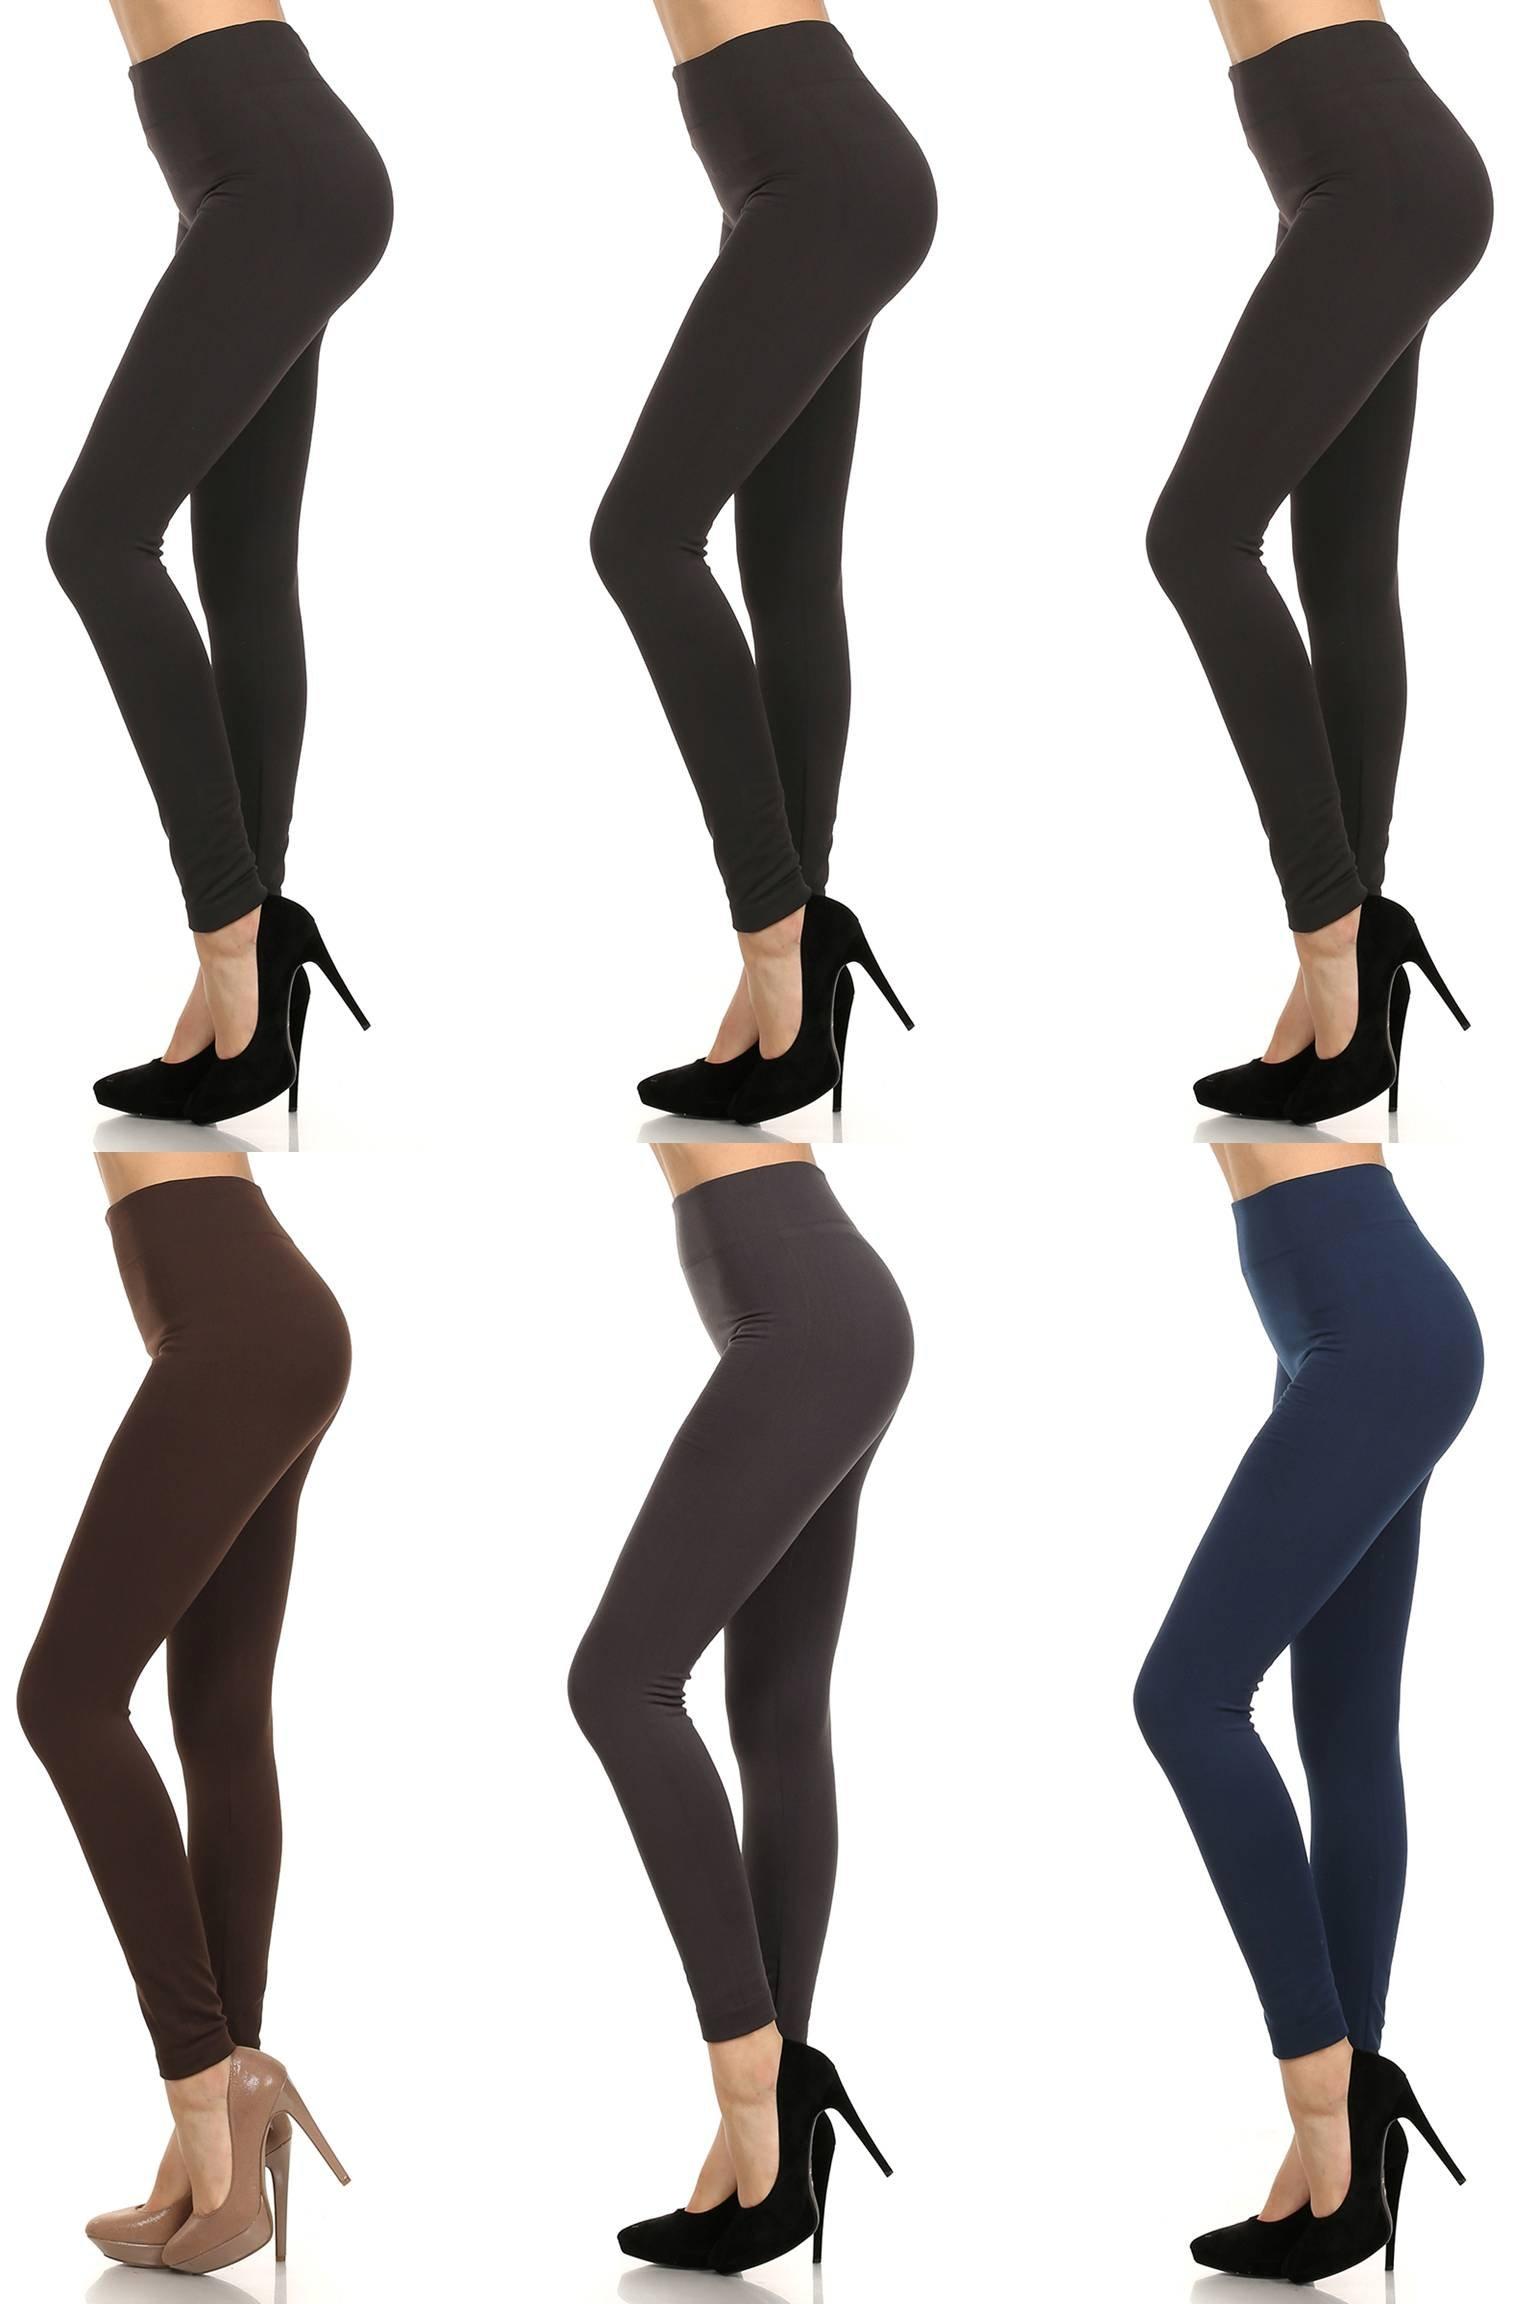 MOPAS 6-pack: Seamless Fleece Lined Leggings - Stretchy Multi Colors by MOPAS